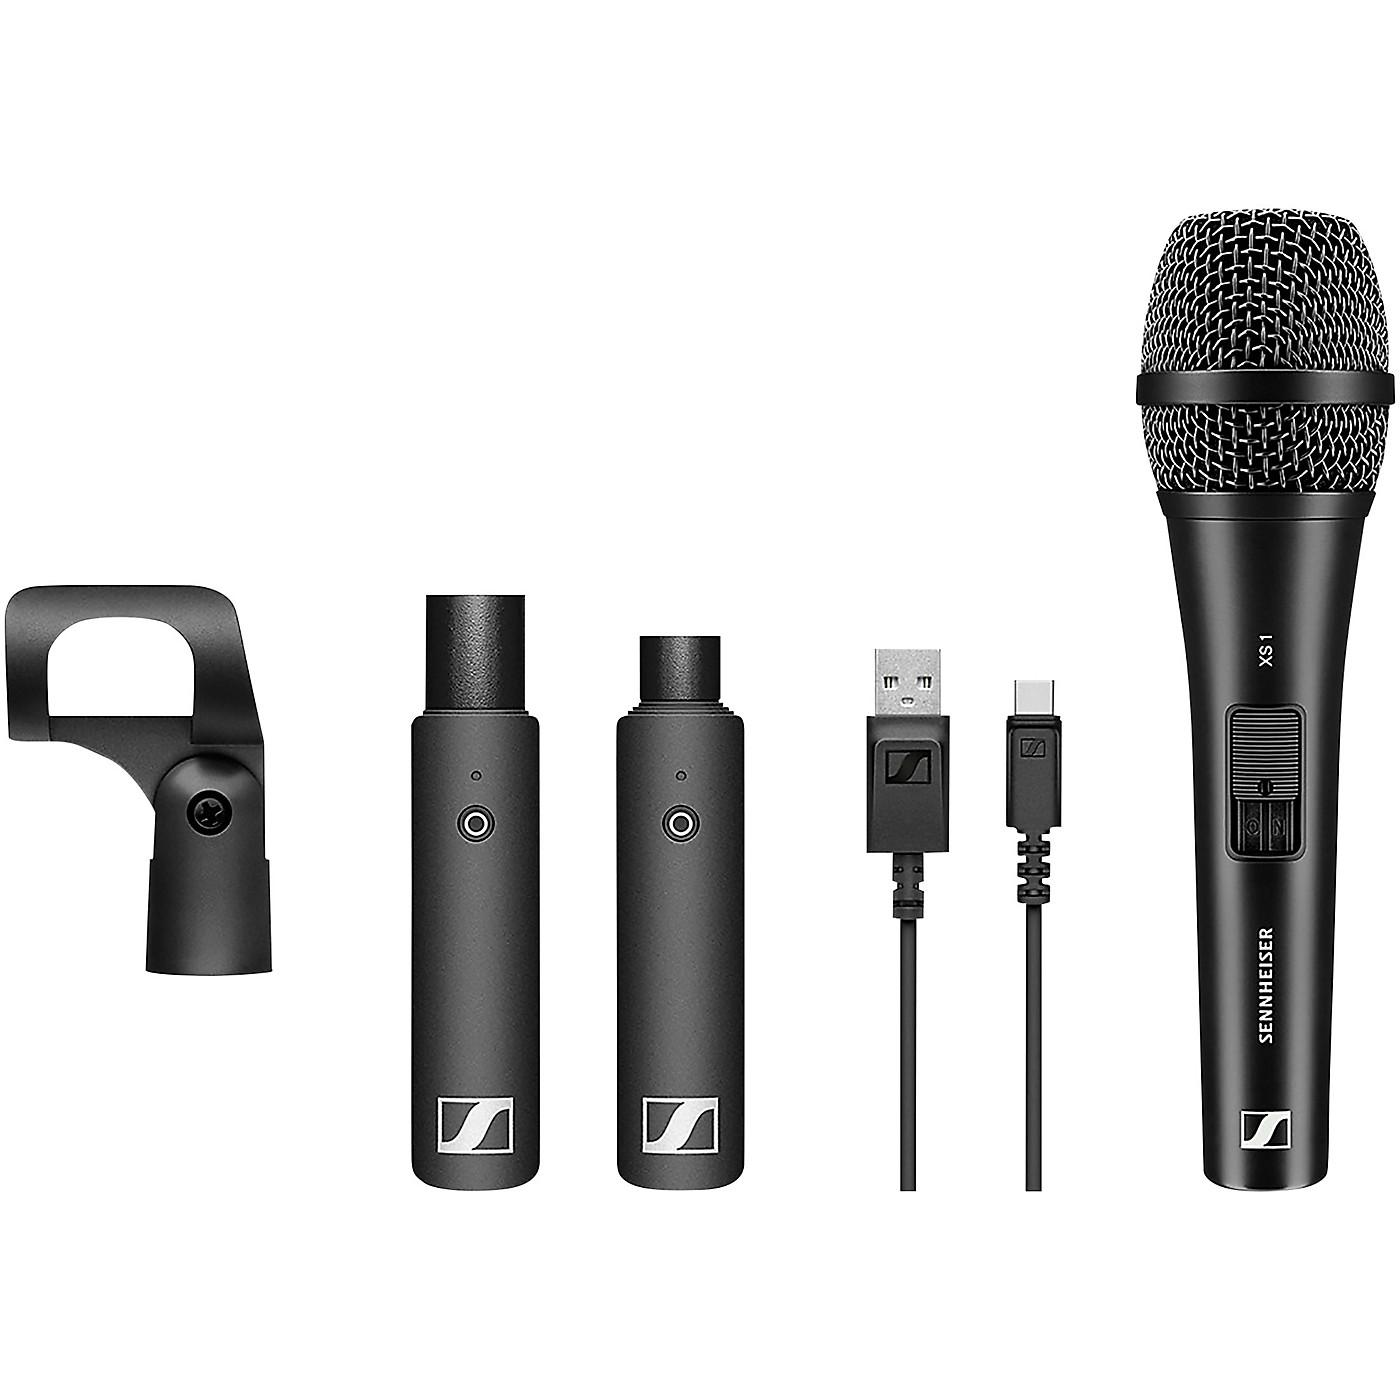 Sennheiser XSW-D VOCAL SET Wireless Handheld System thumbnail